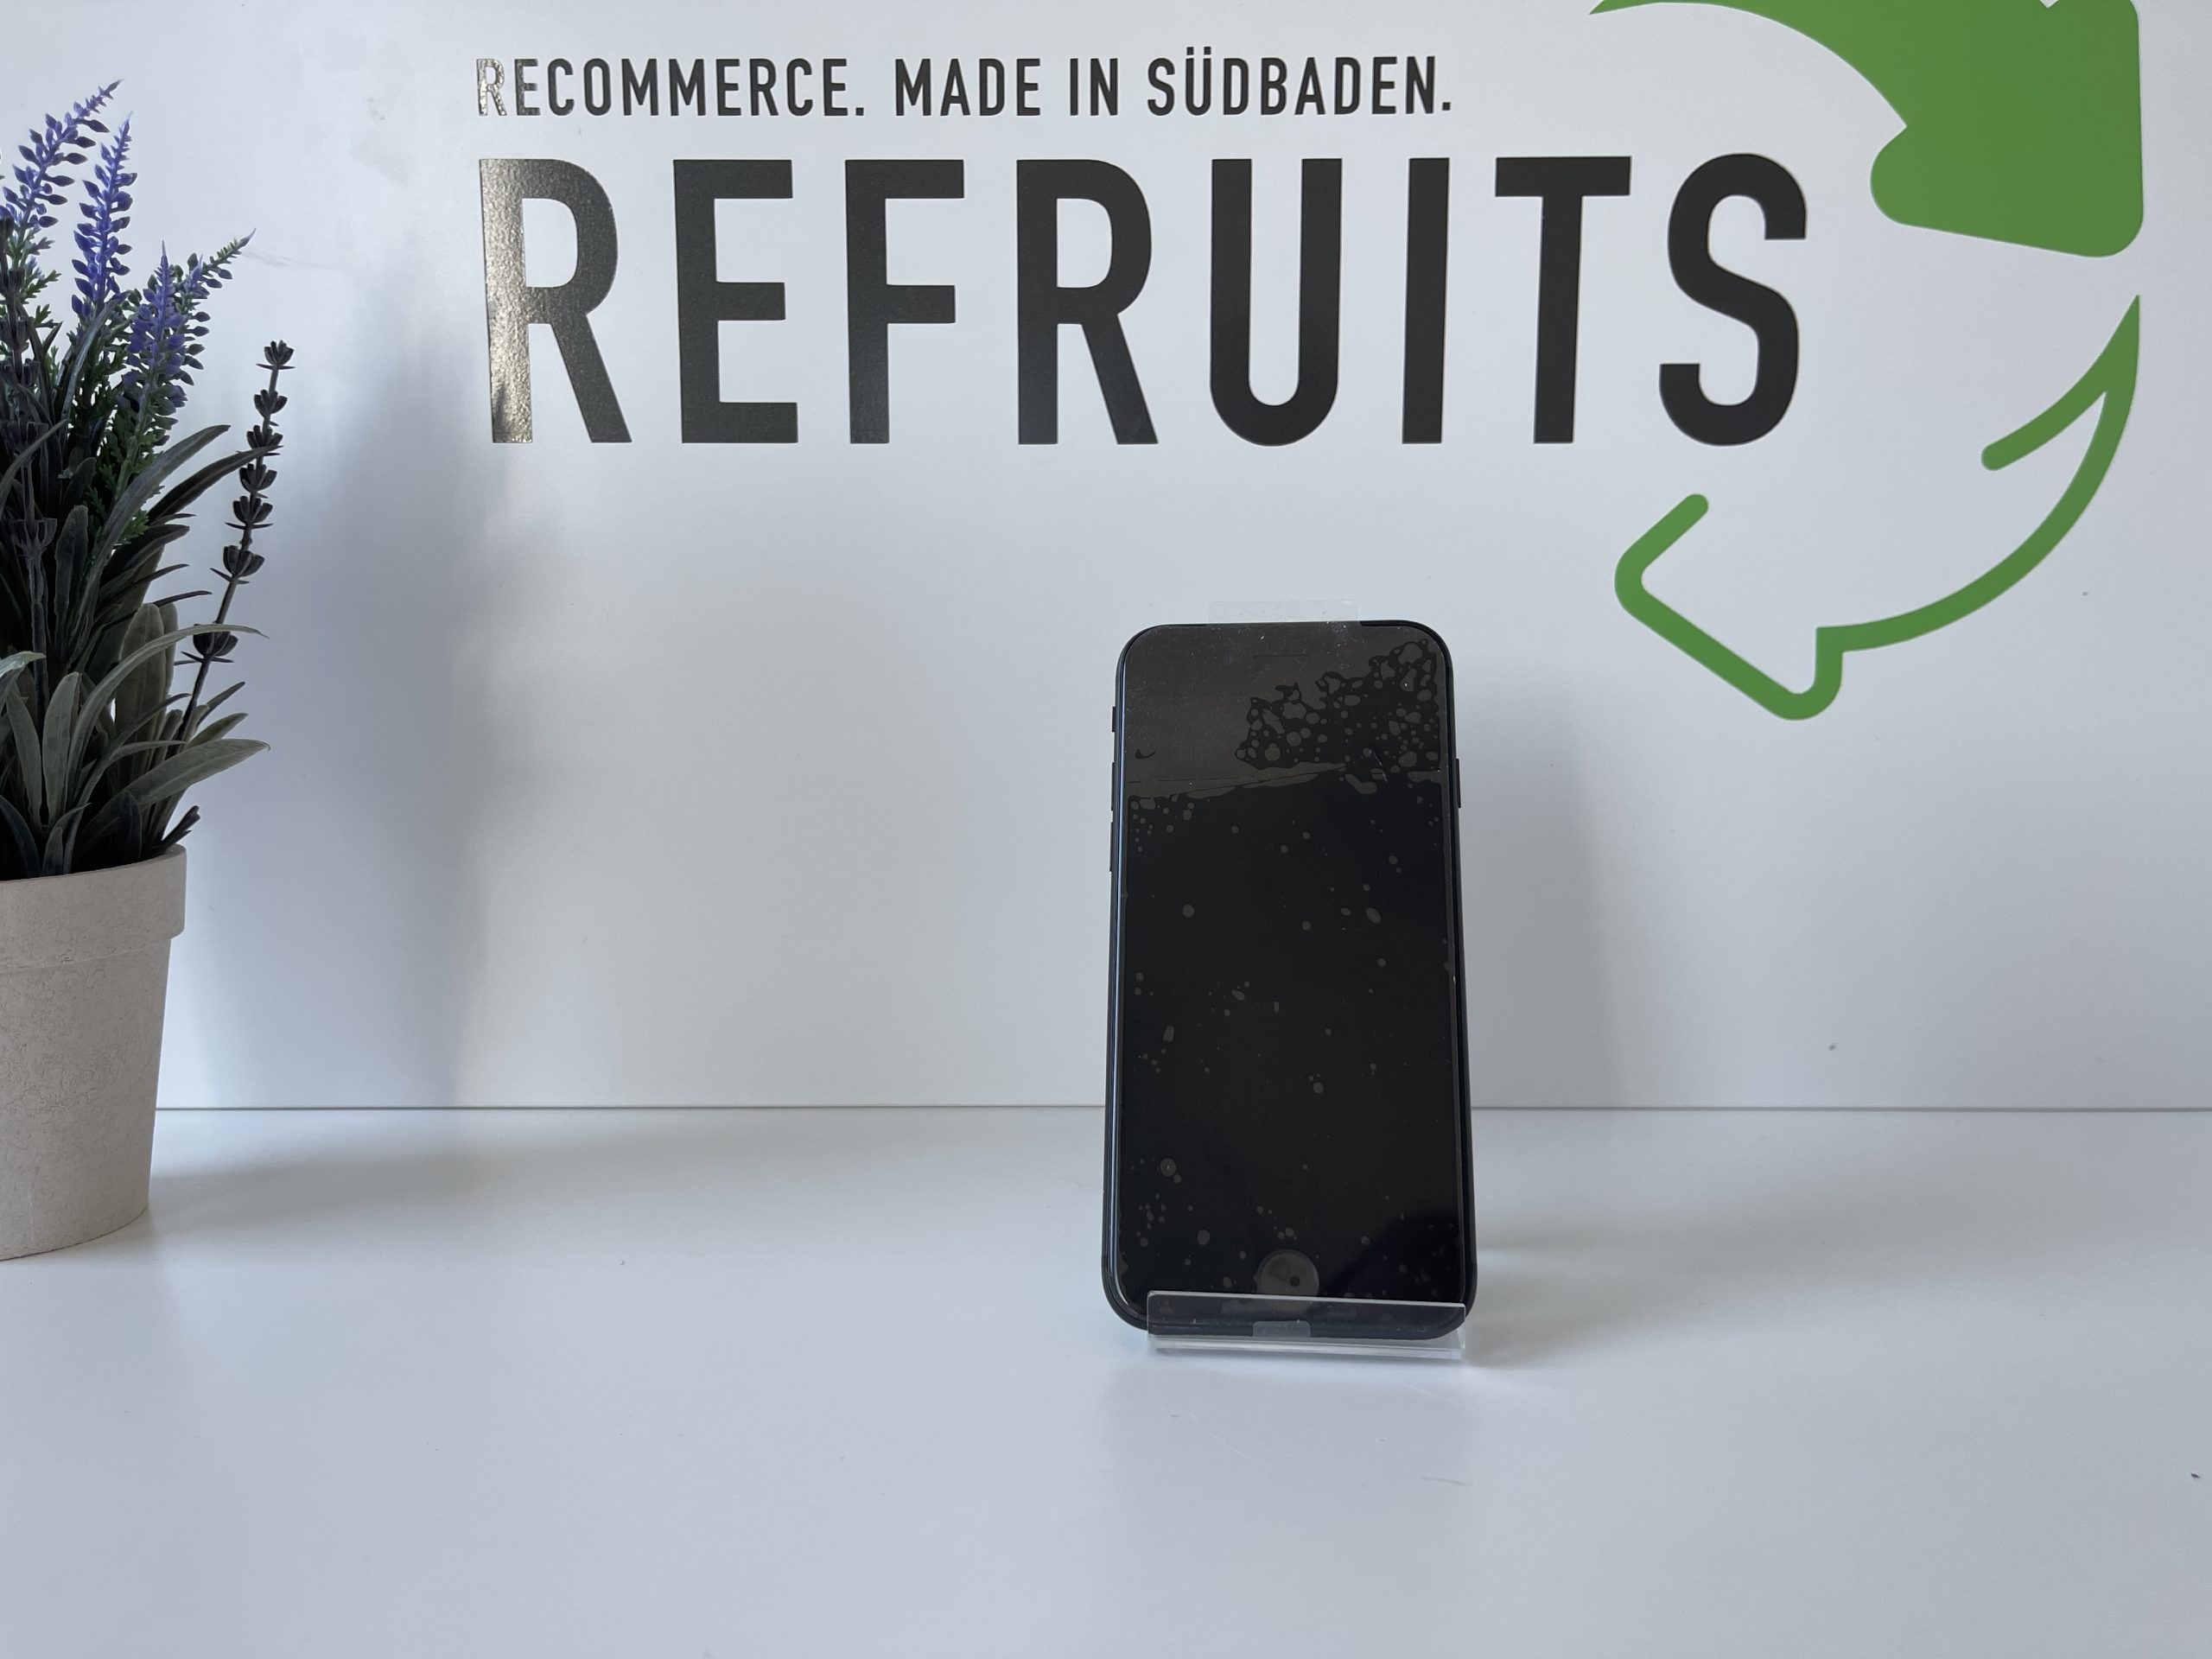 Apple iPhone 8 64GB Space Grau ✔Wie Neu ✔Akku 98-100%